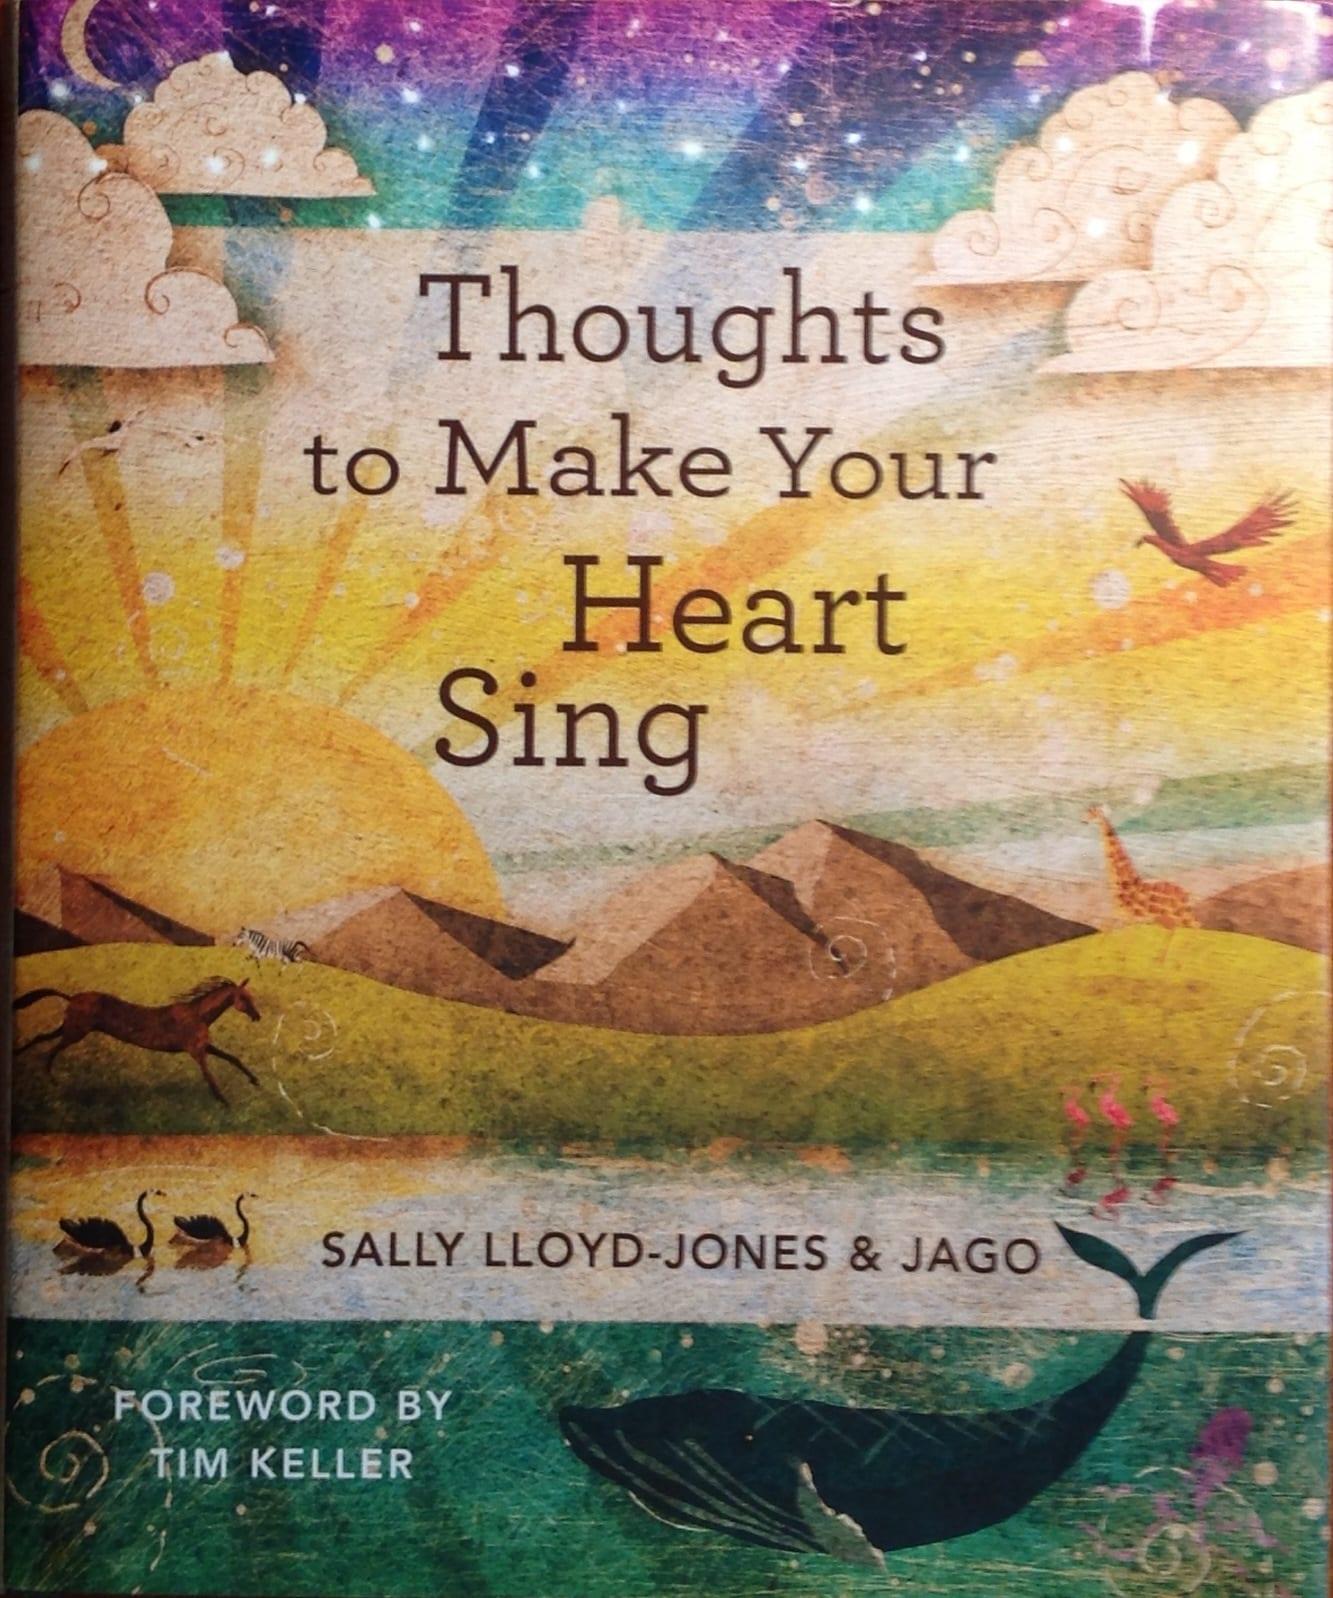 sally-lloyd-jones-jago-thoughts-make-heart-sing.jpg